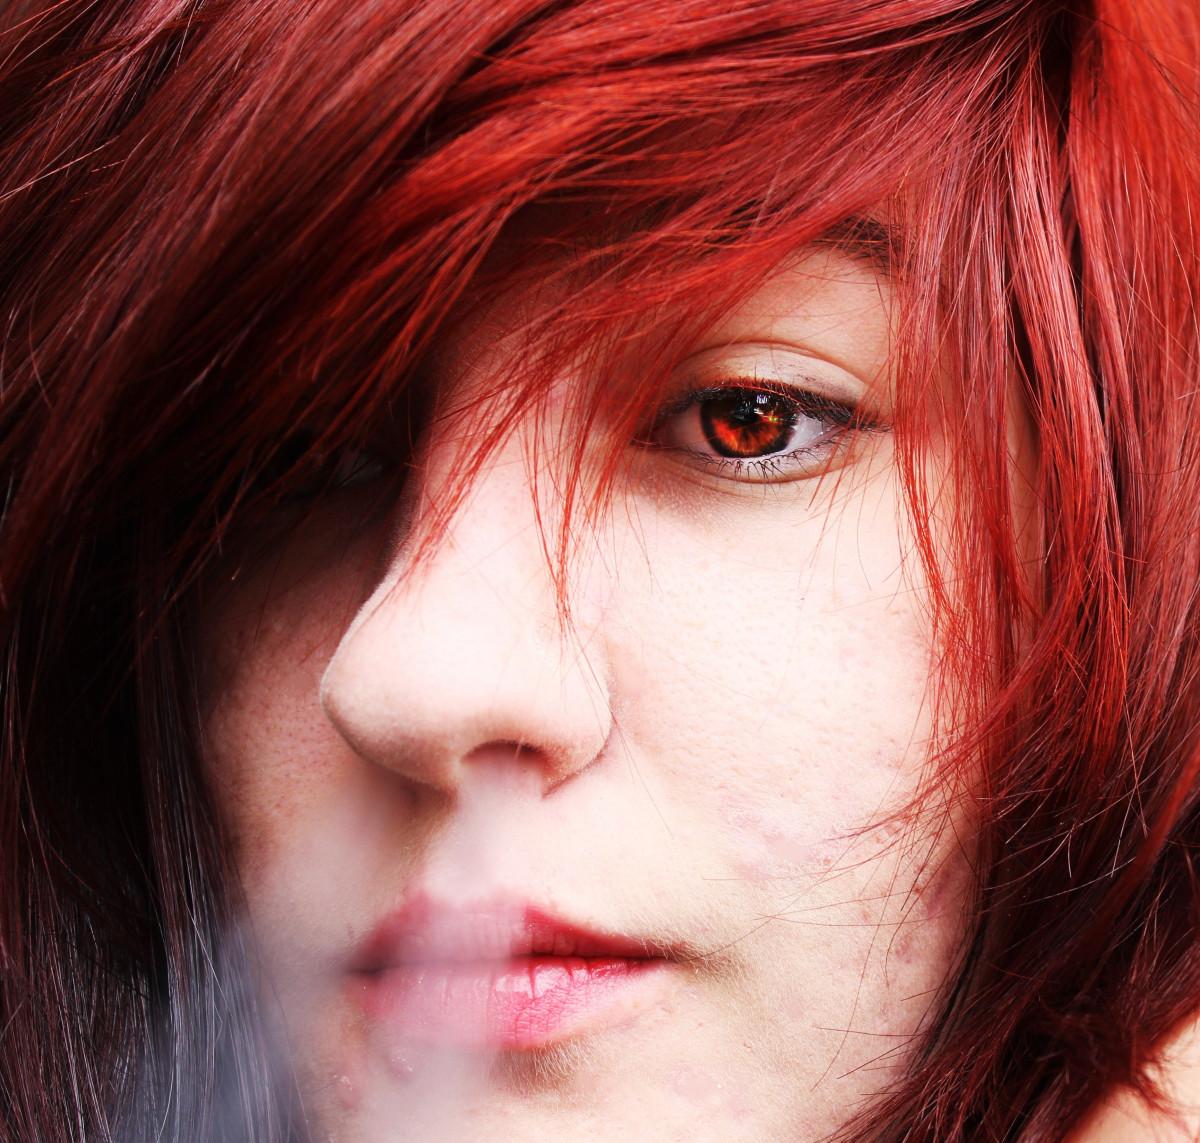 kostenlose foto m dchen frau haar rauchen portr t modell rot farbe dame rosa lippe. Black Bedroom Furniture Sets. Home Design Ideas